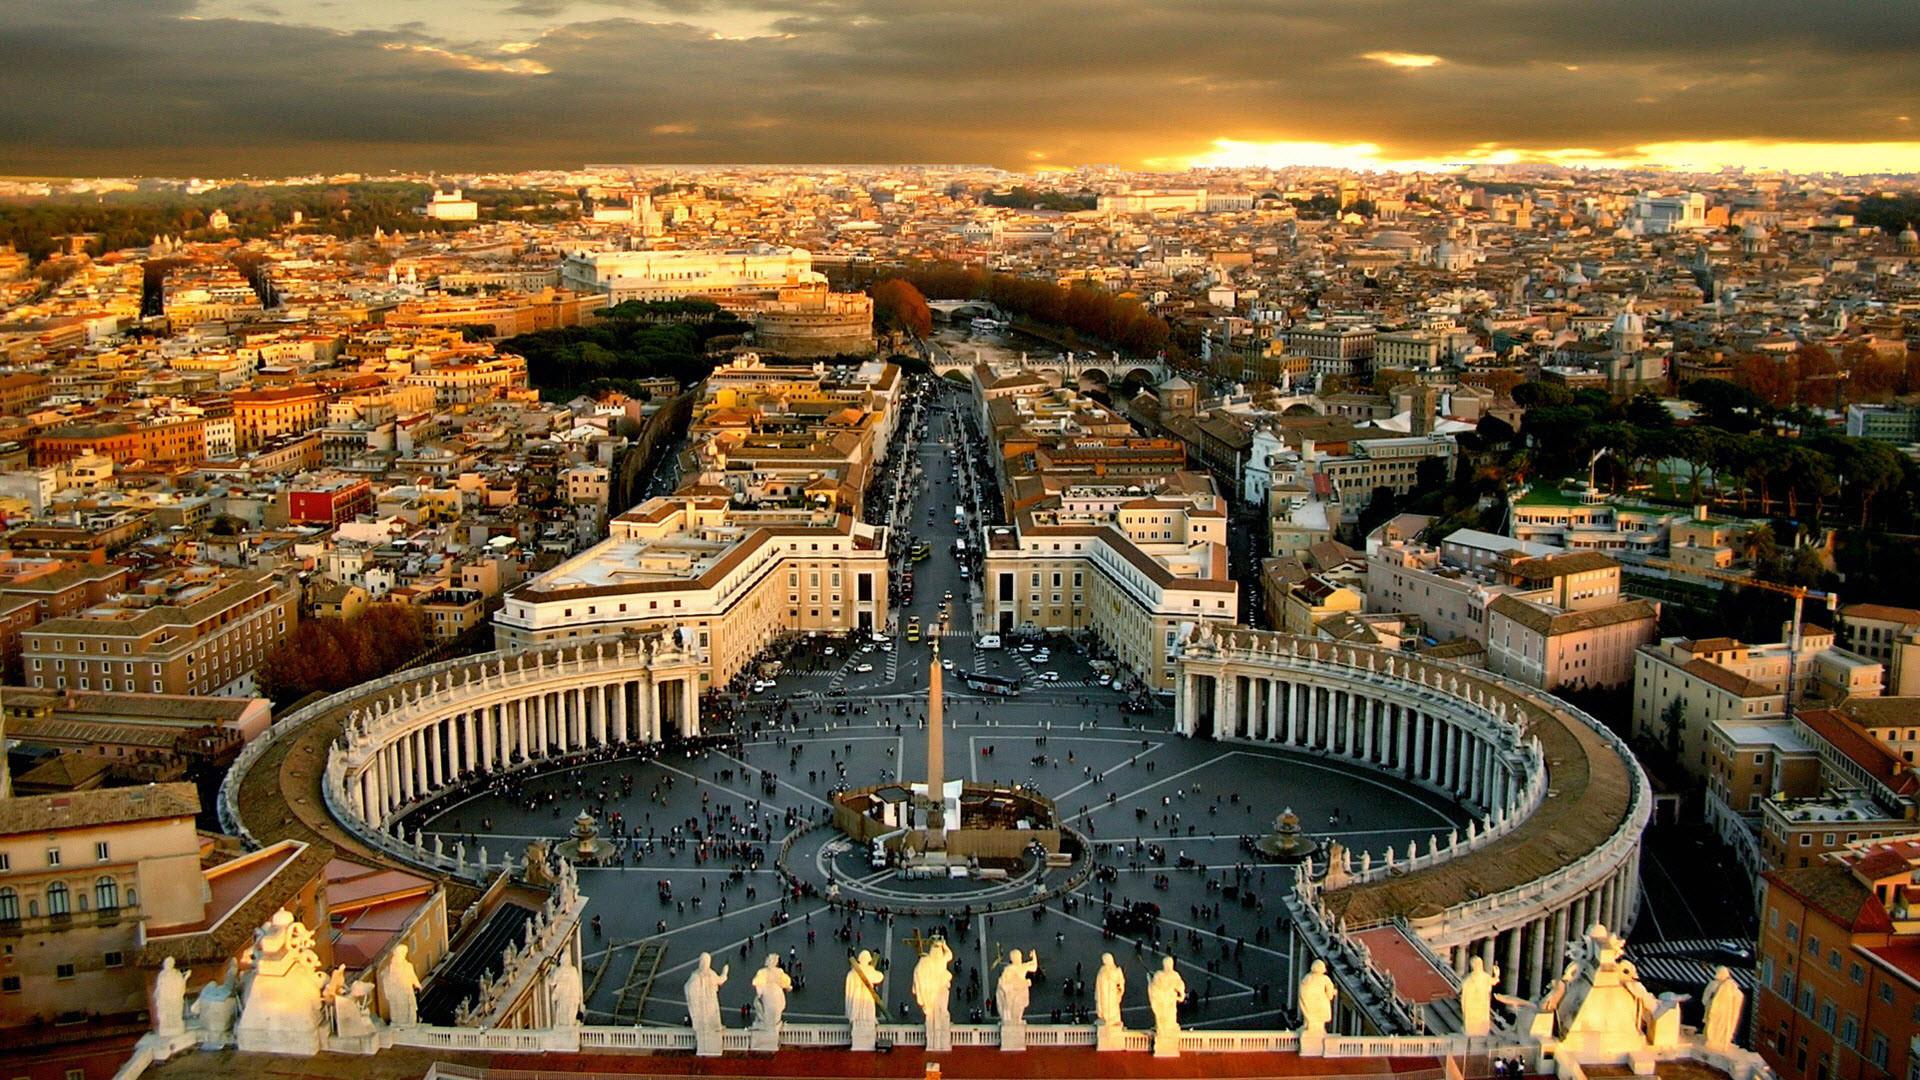 Roman Catholic Wallpaper 1